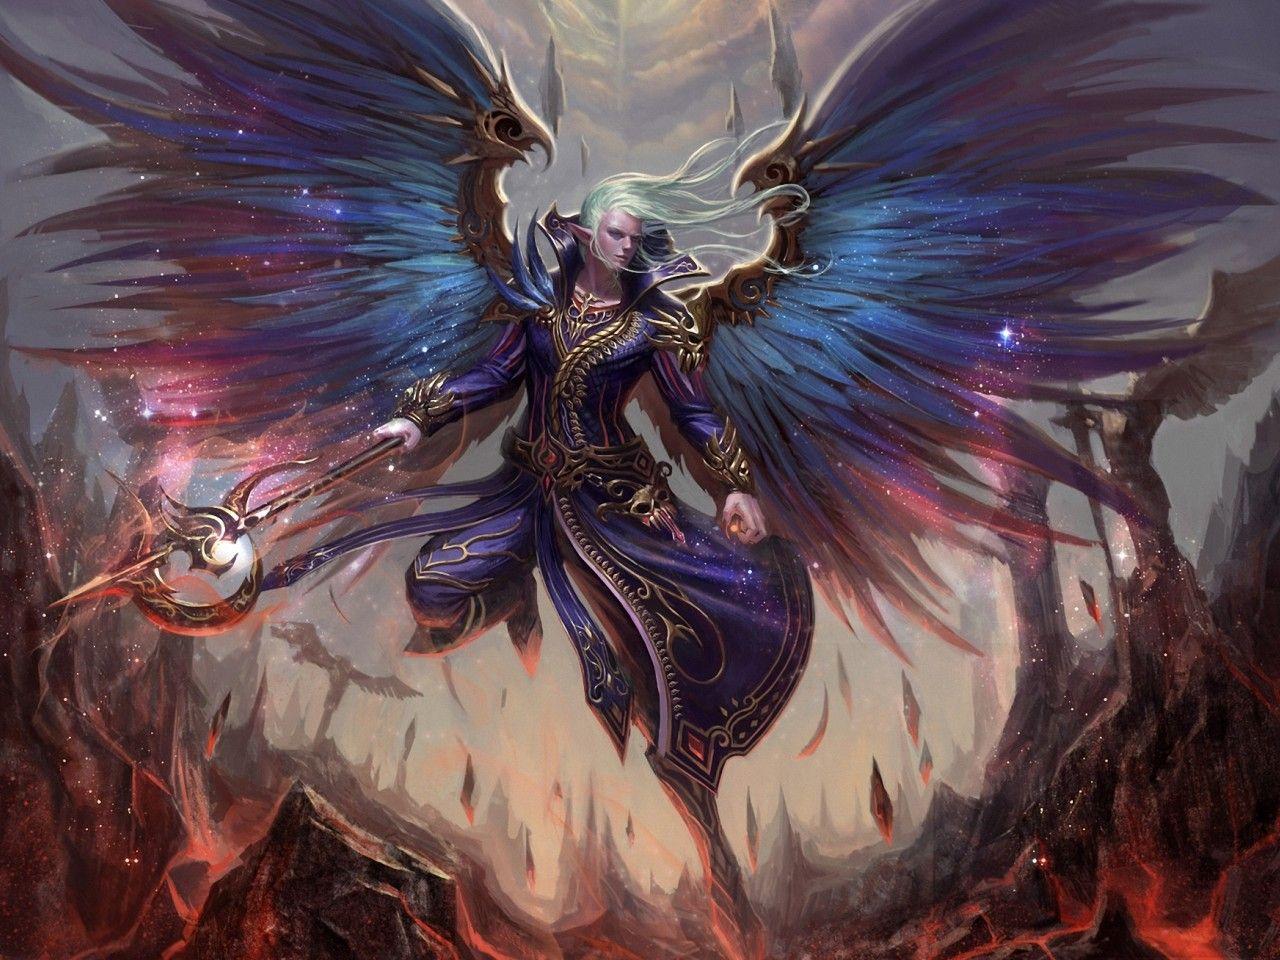 Cool Wallpaper Horse Angel - 73b876b86945cdc38be11d6025d12eae  Gallery_734377.jpg